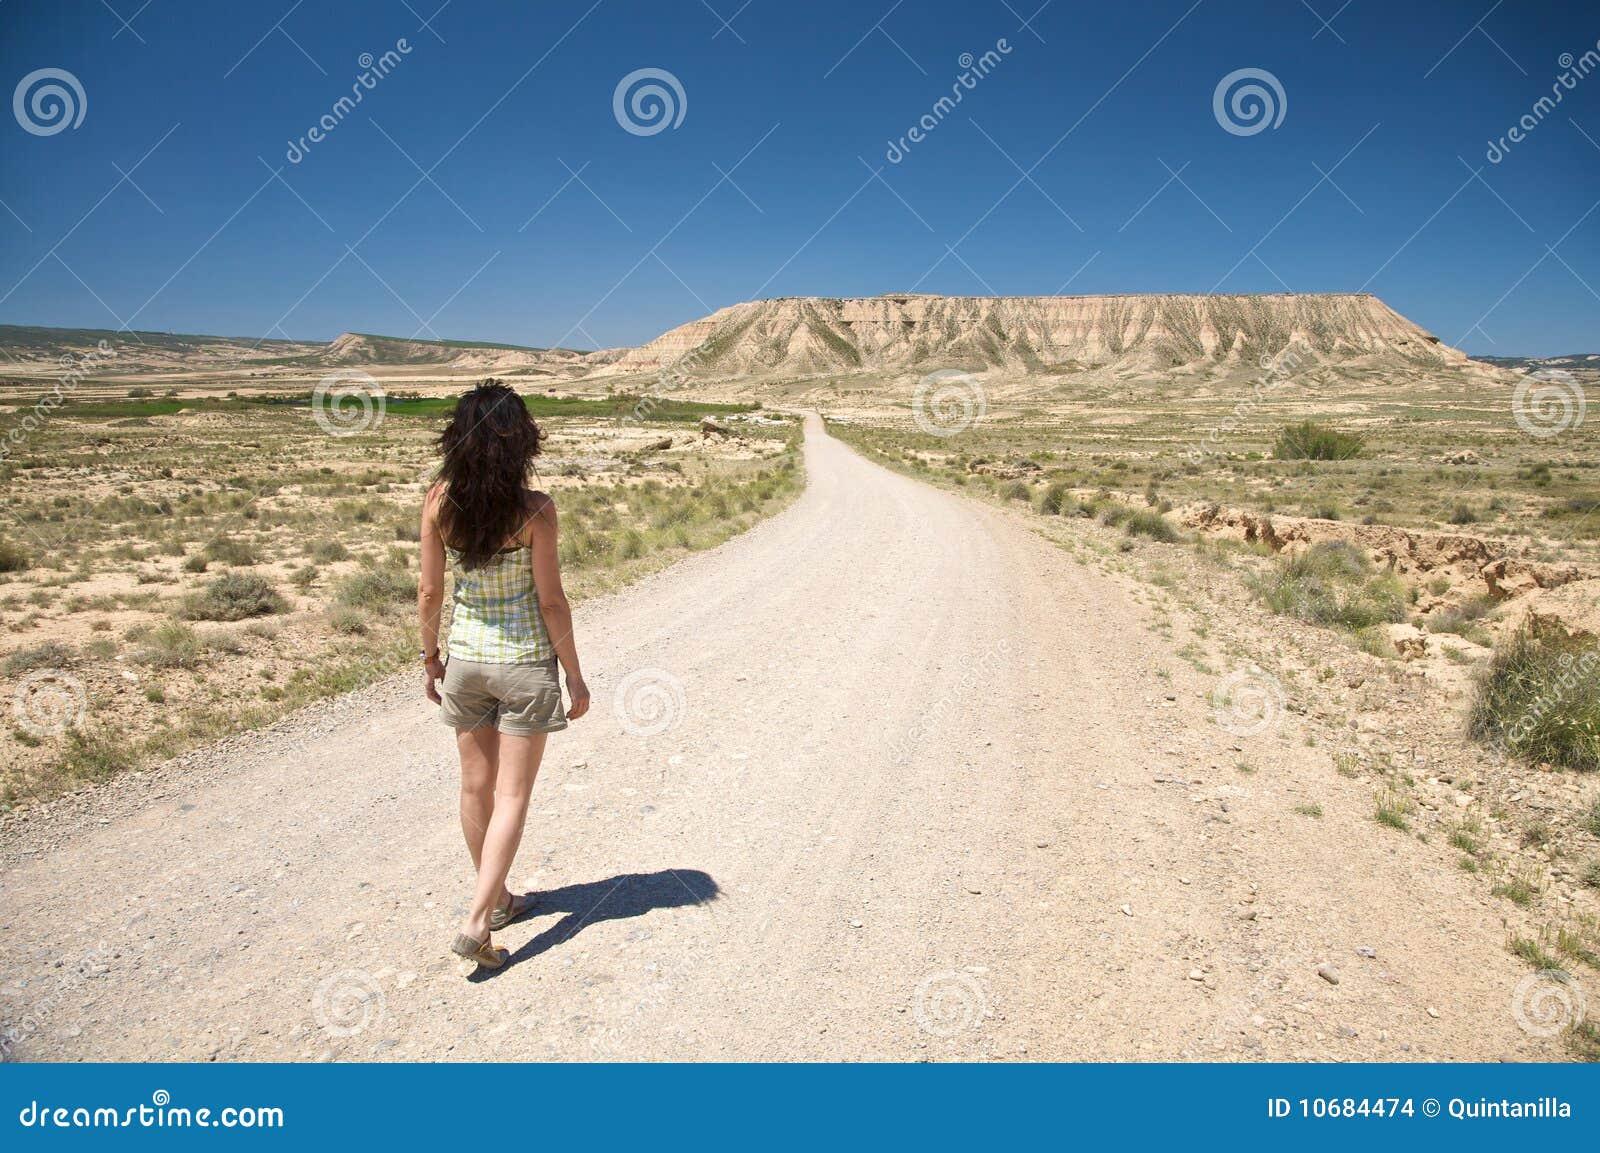 Women nude desert hiking phrase